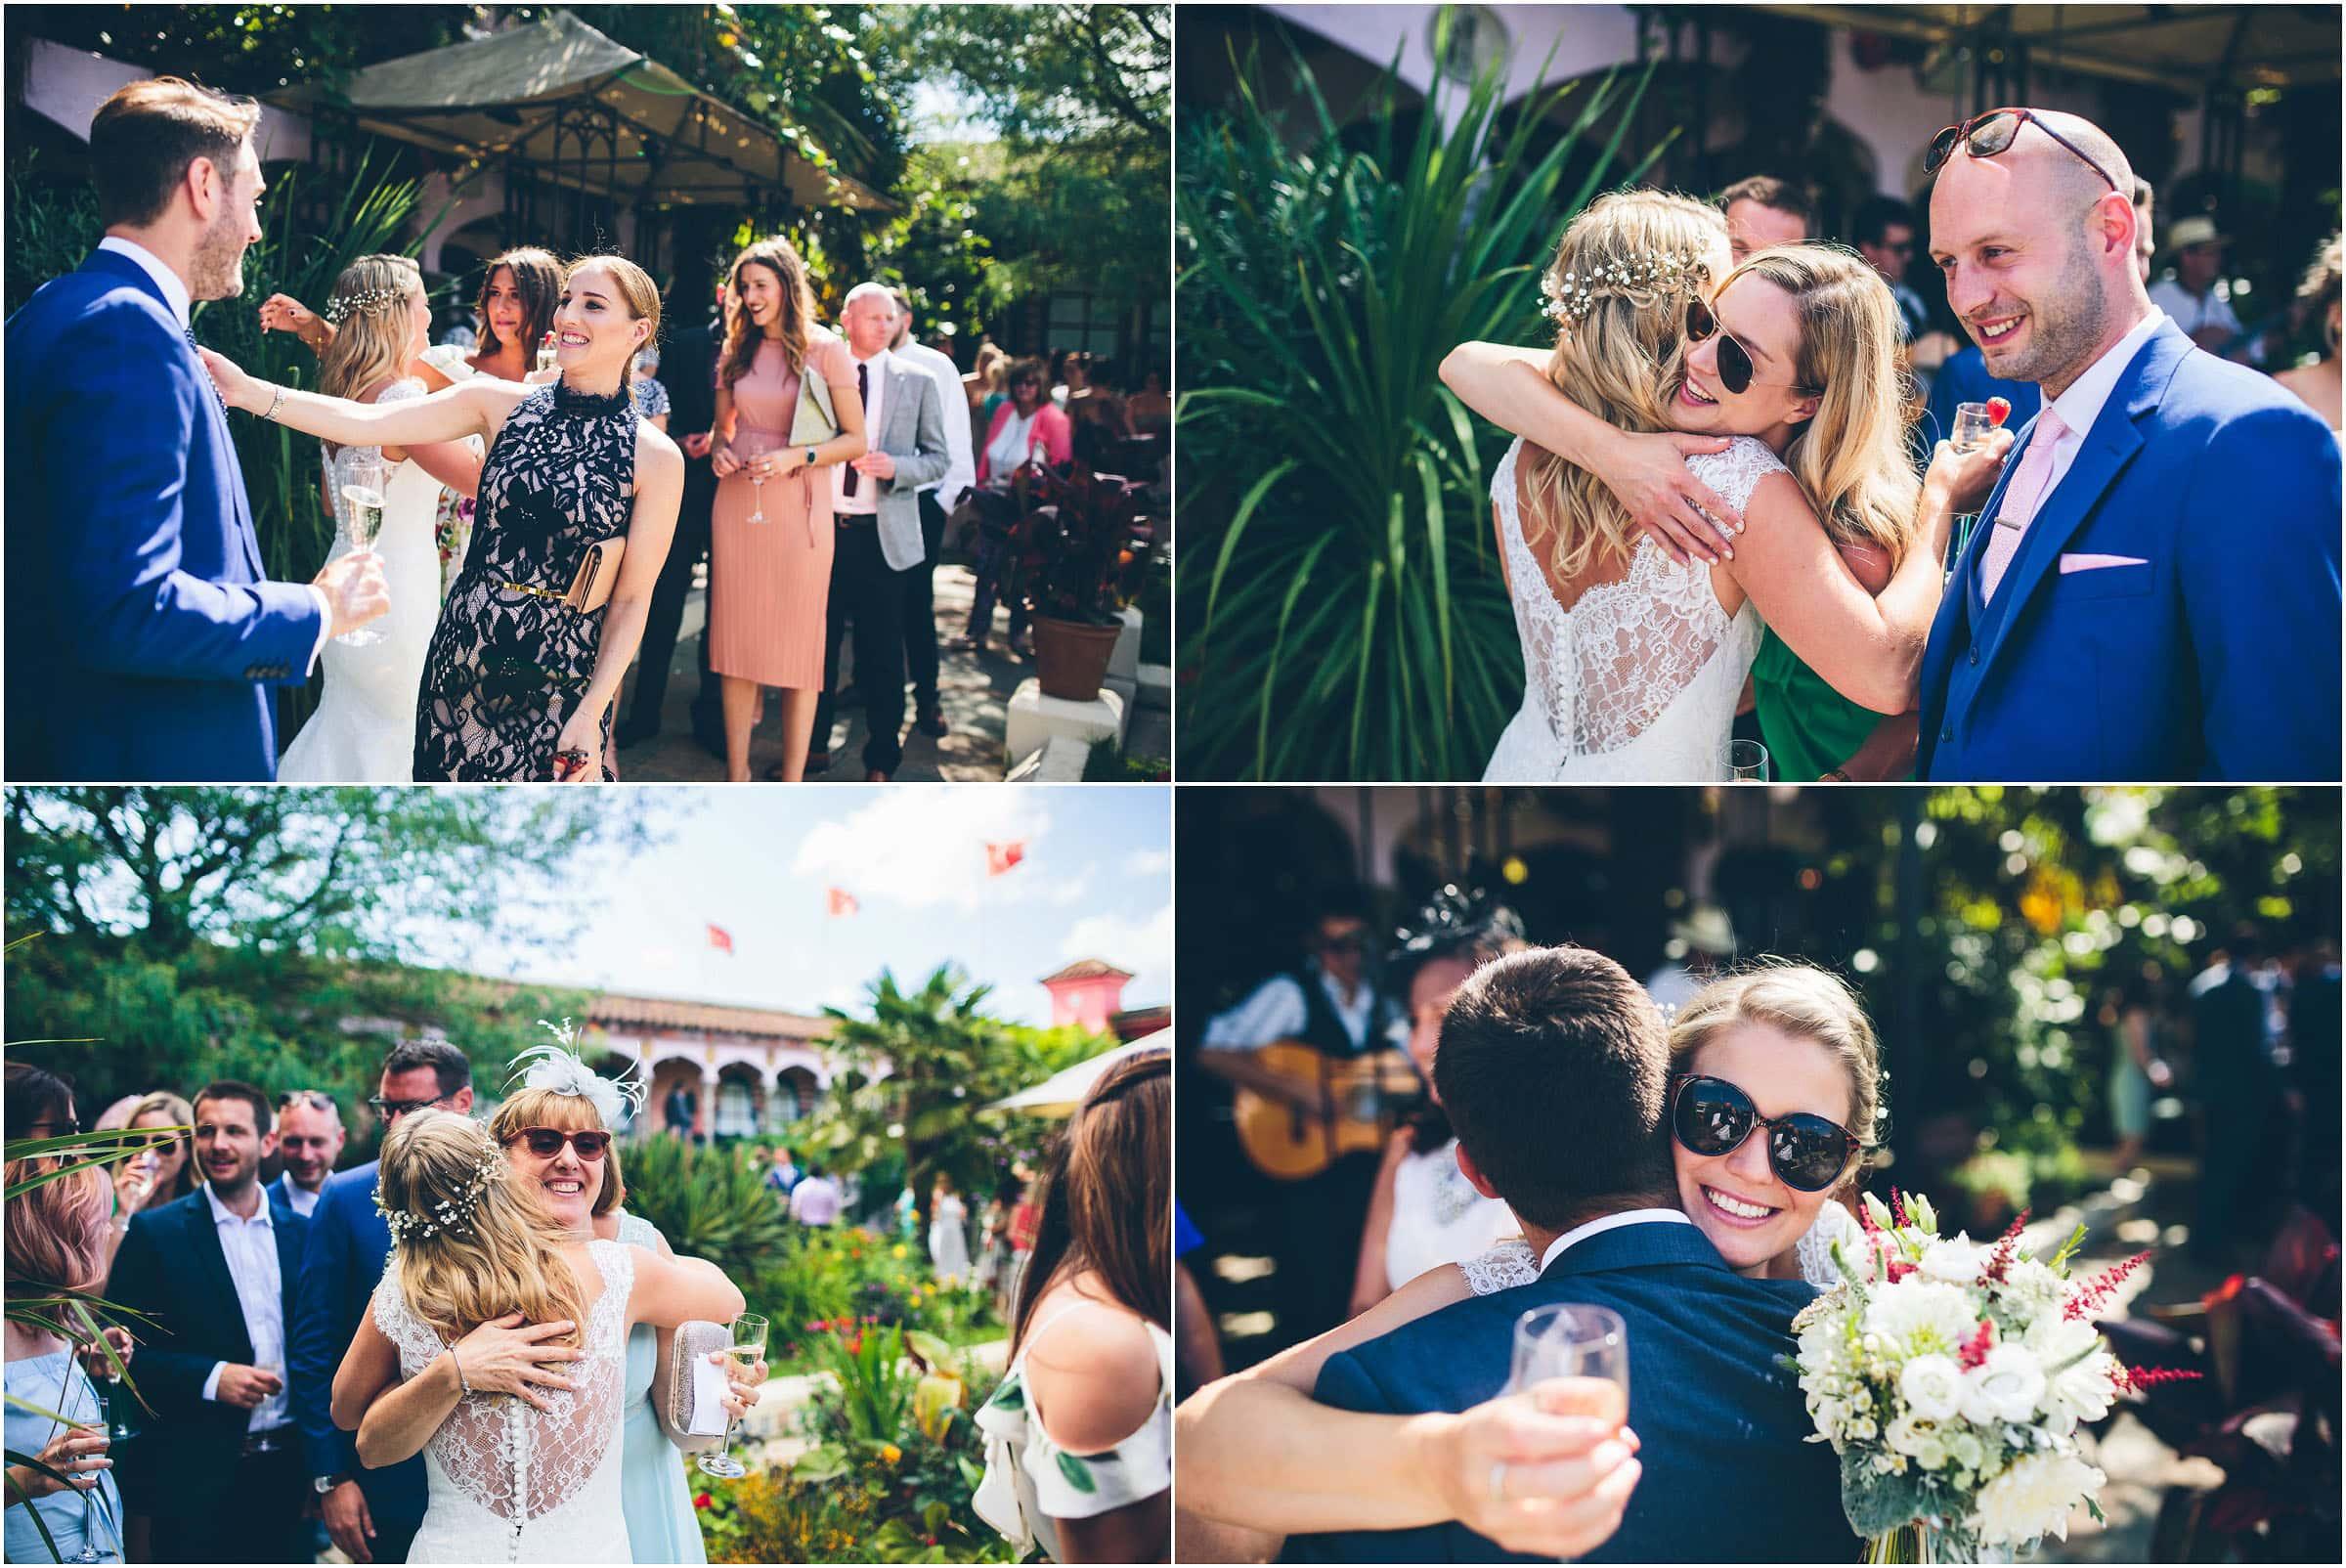 Kensington_Roof_Gardens_Wedding_Photography_0047